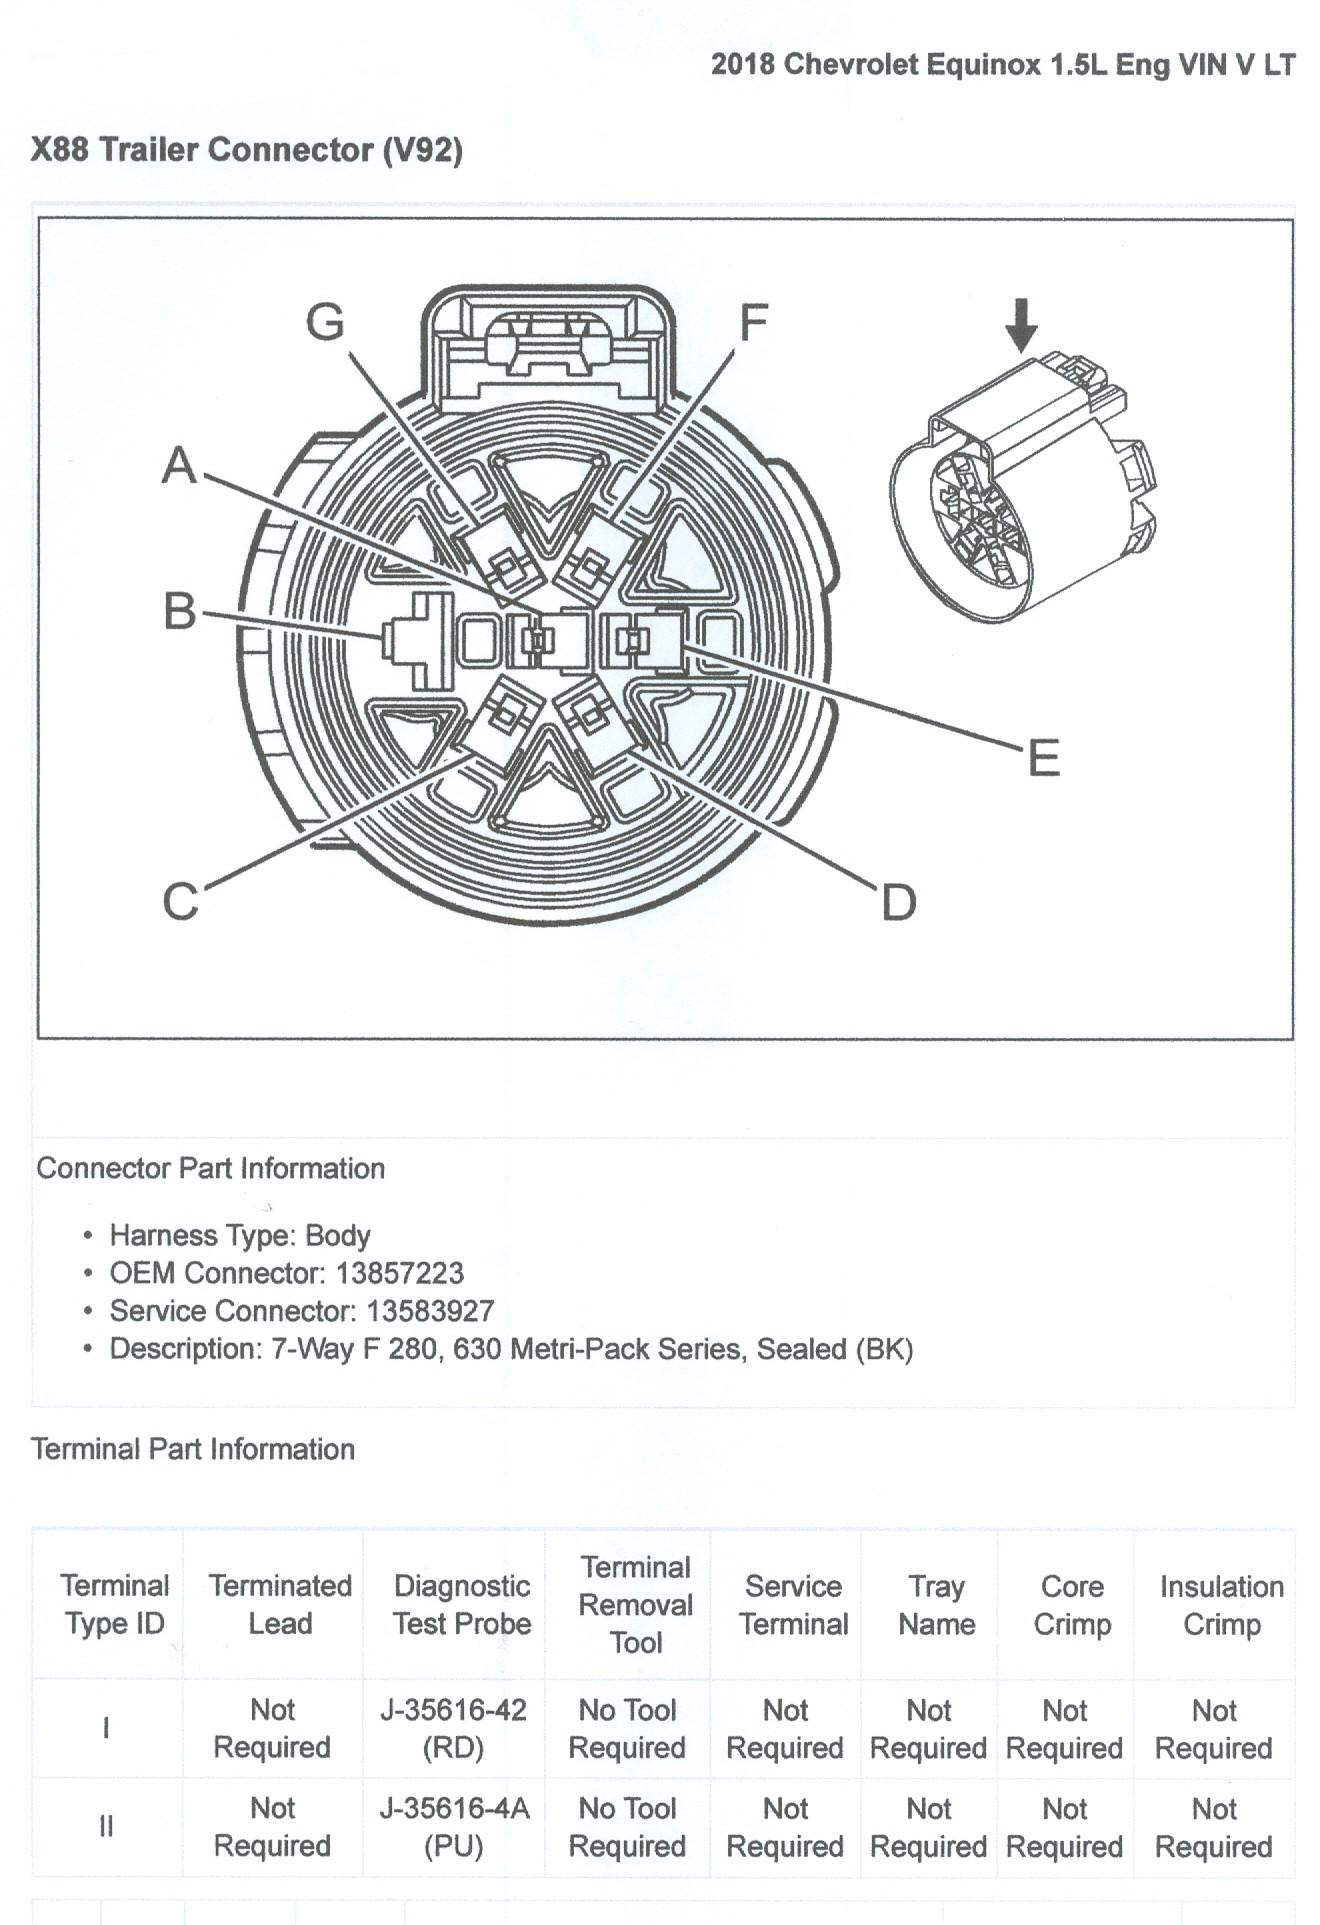 2017 Chevrolet Trailer Wiring Diagram